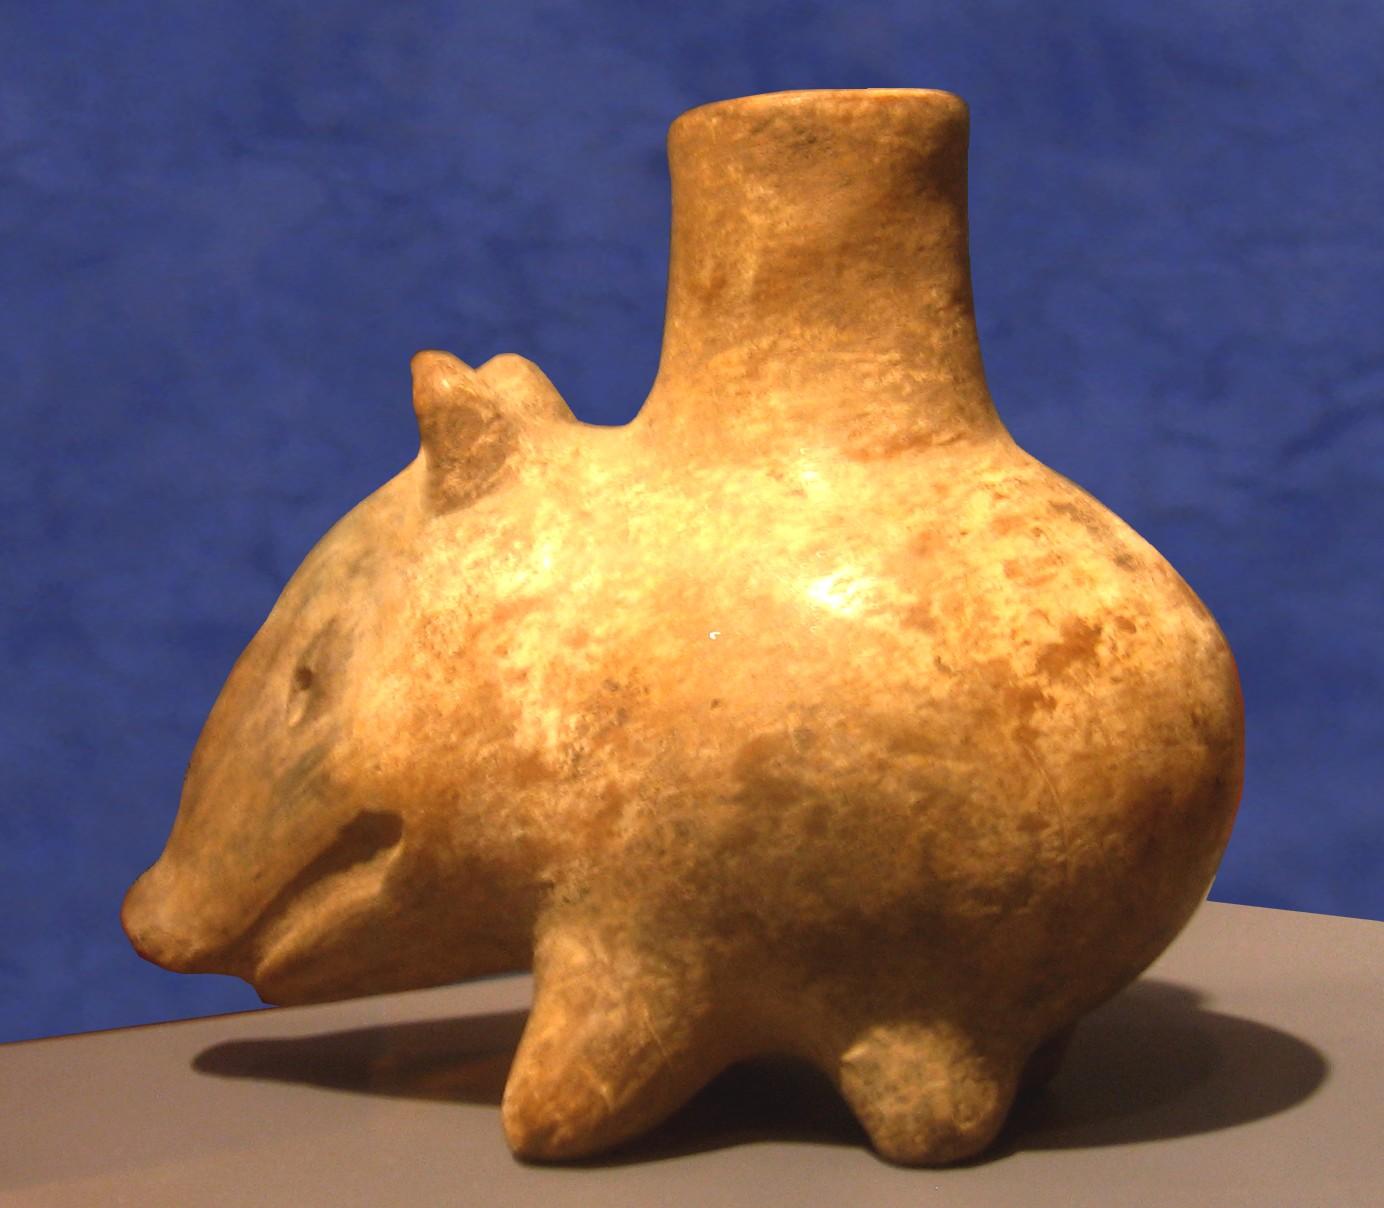 https://images3.wikia.nocookie.net/__cb20090410203306/ceramica/images/c/c4/Tlatilco_culture_peccary_vessel_(Snite).jpg